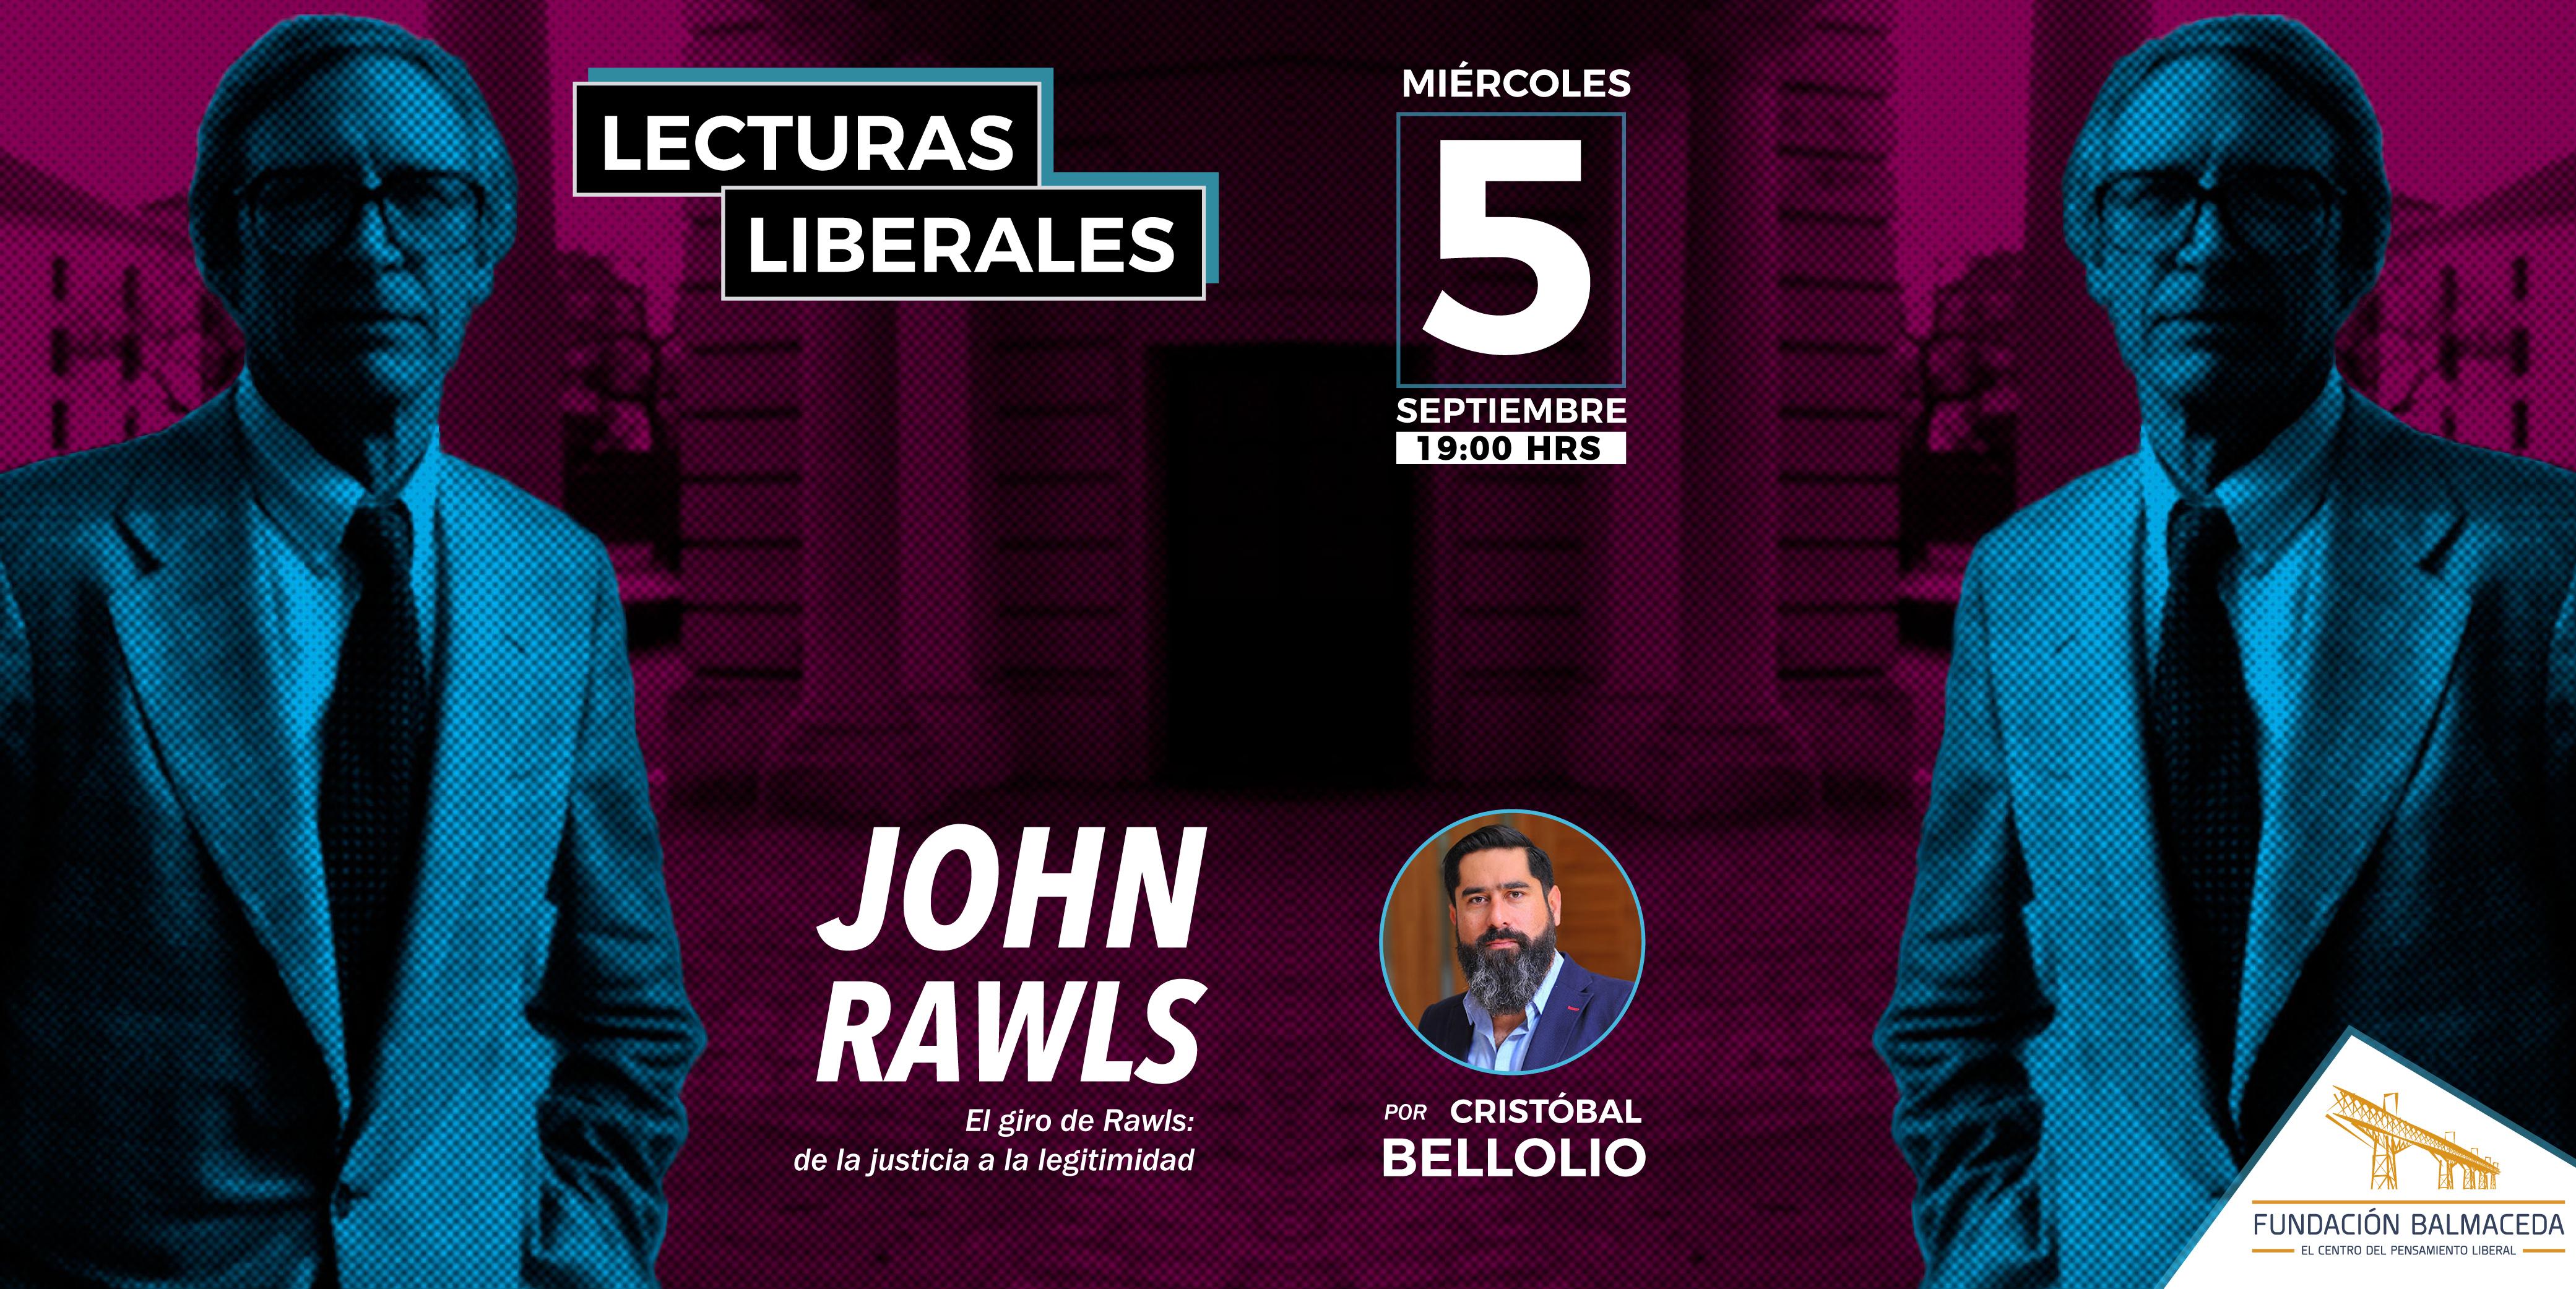 Lecturas Liberales Septiembre: El giro de Rawls, de la justicia a la legitimidad